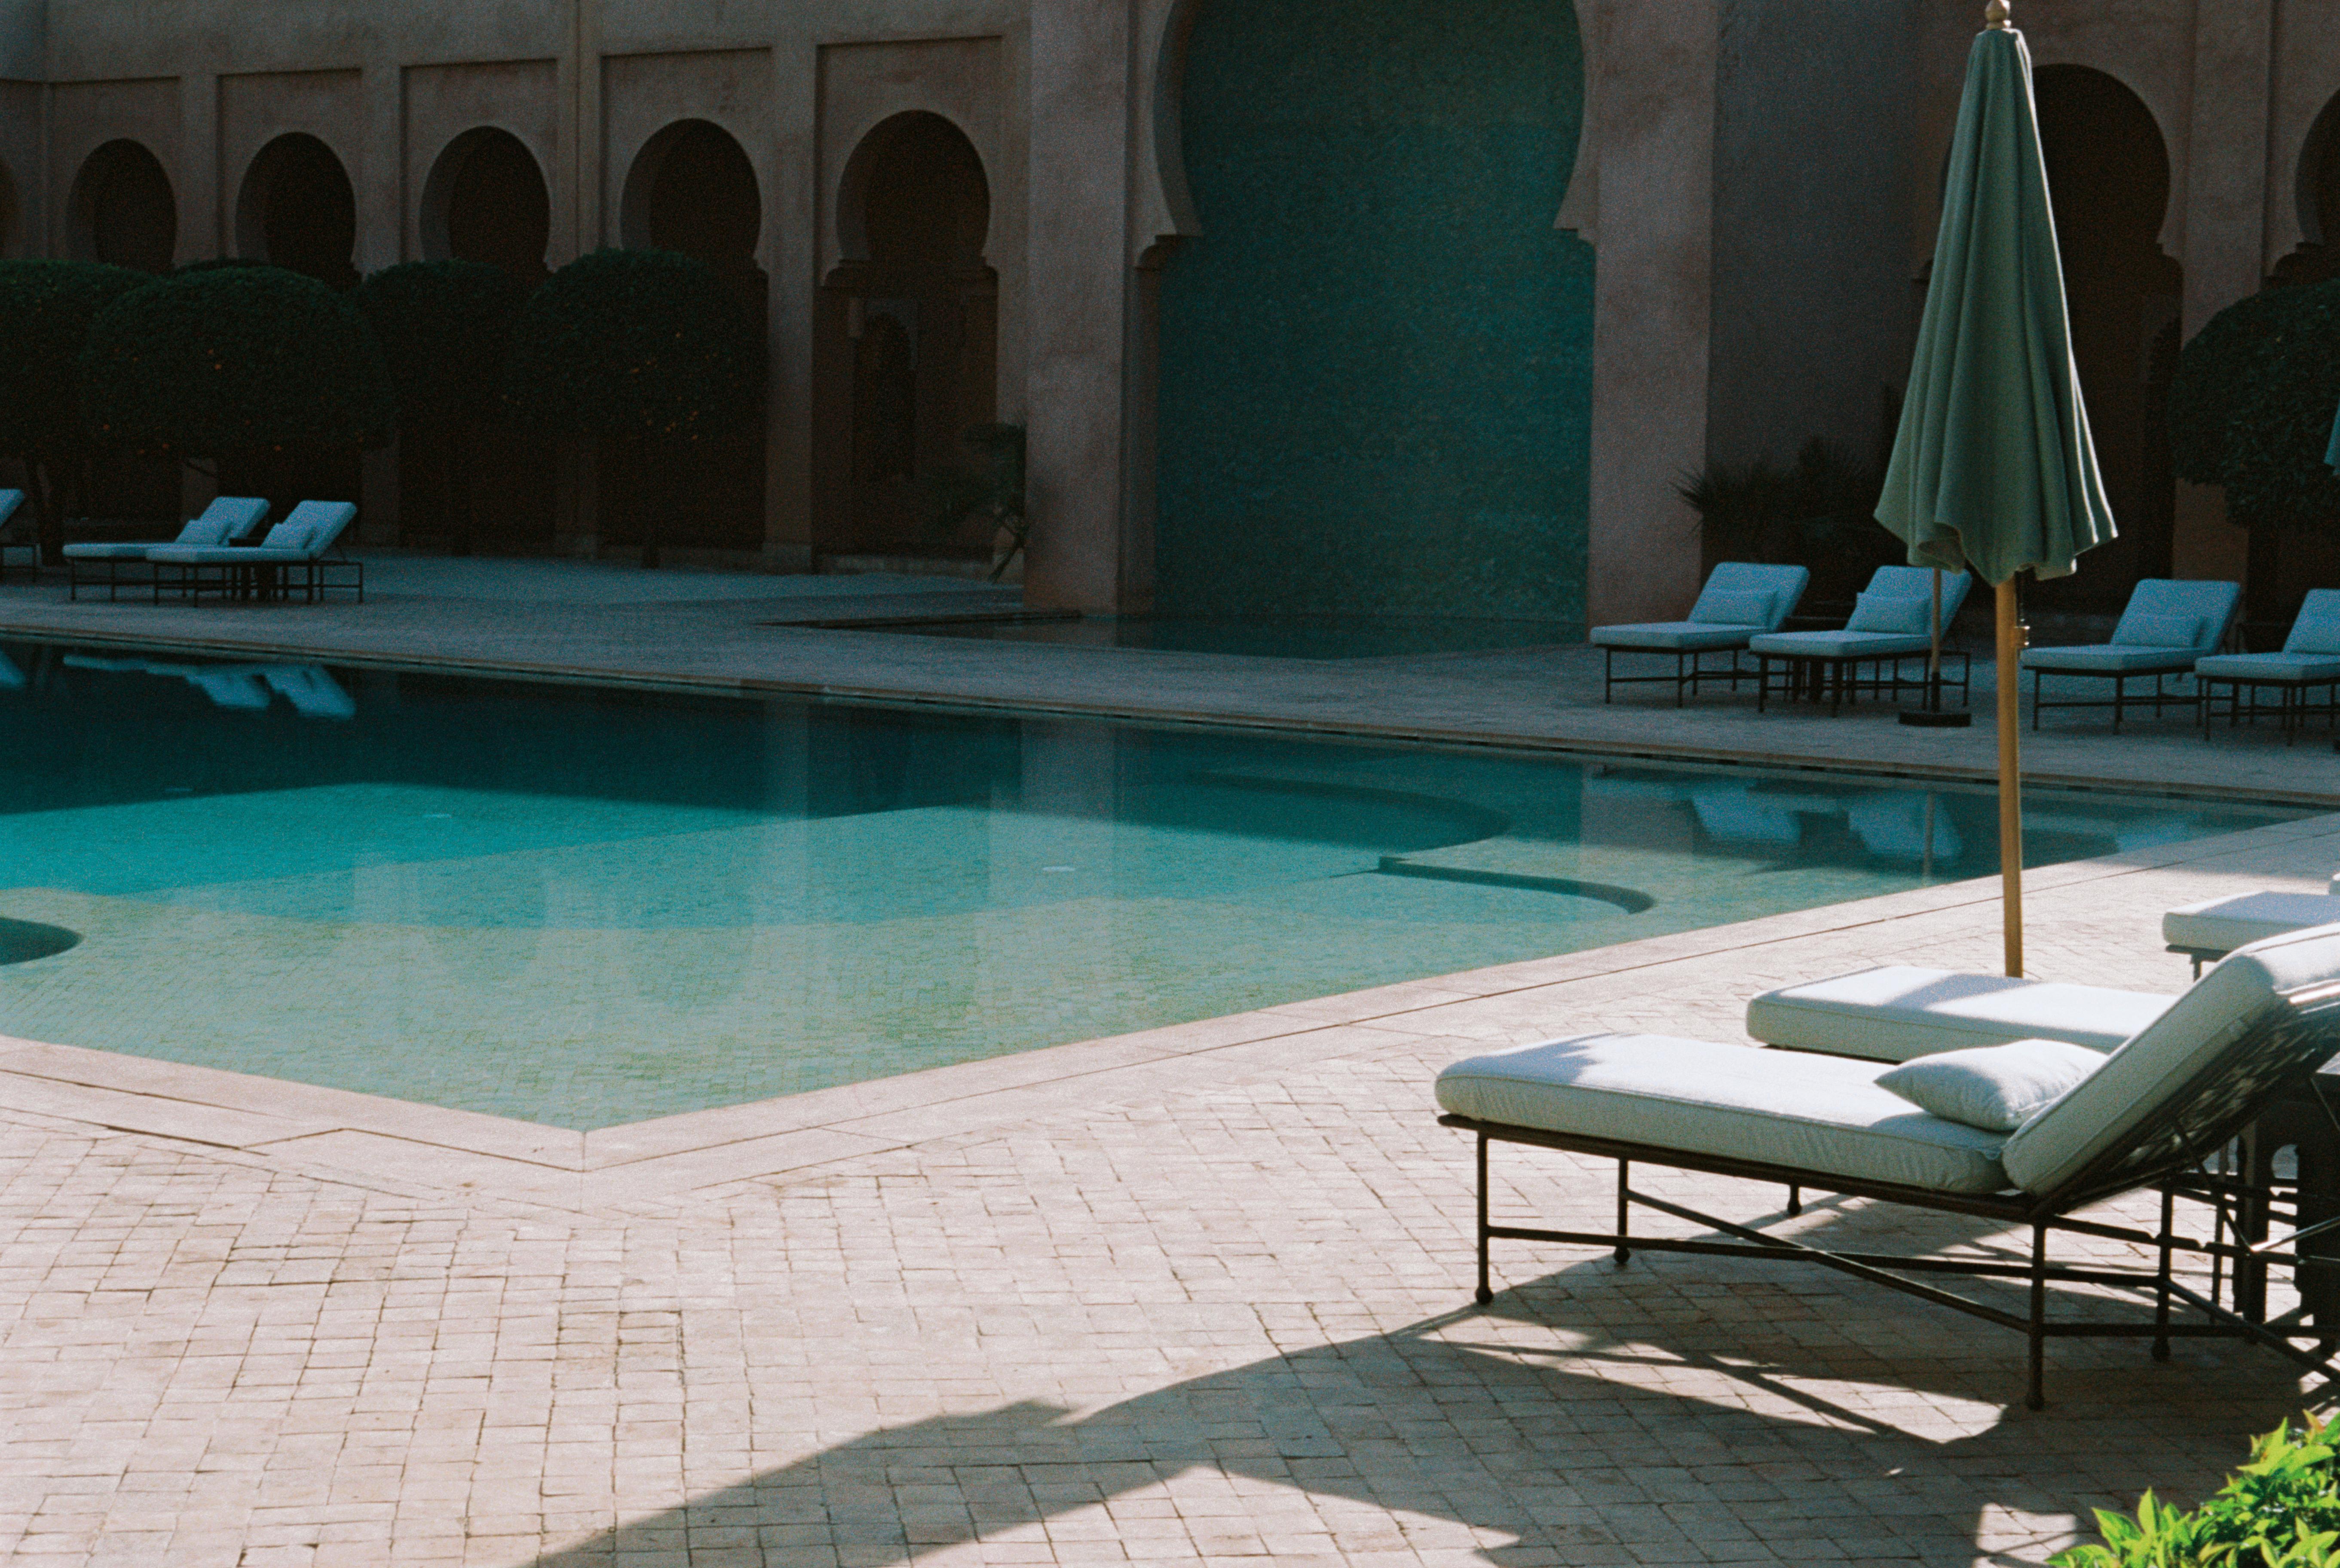 25 Amanjena - Marrakech, Morocco - Studi